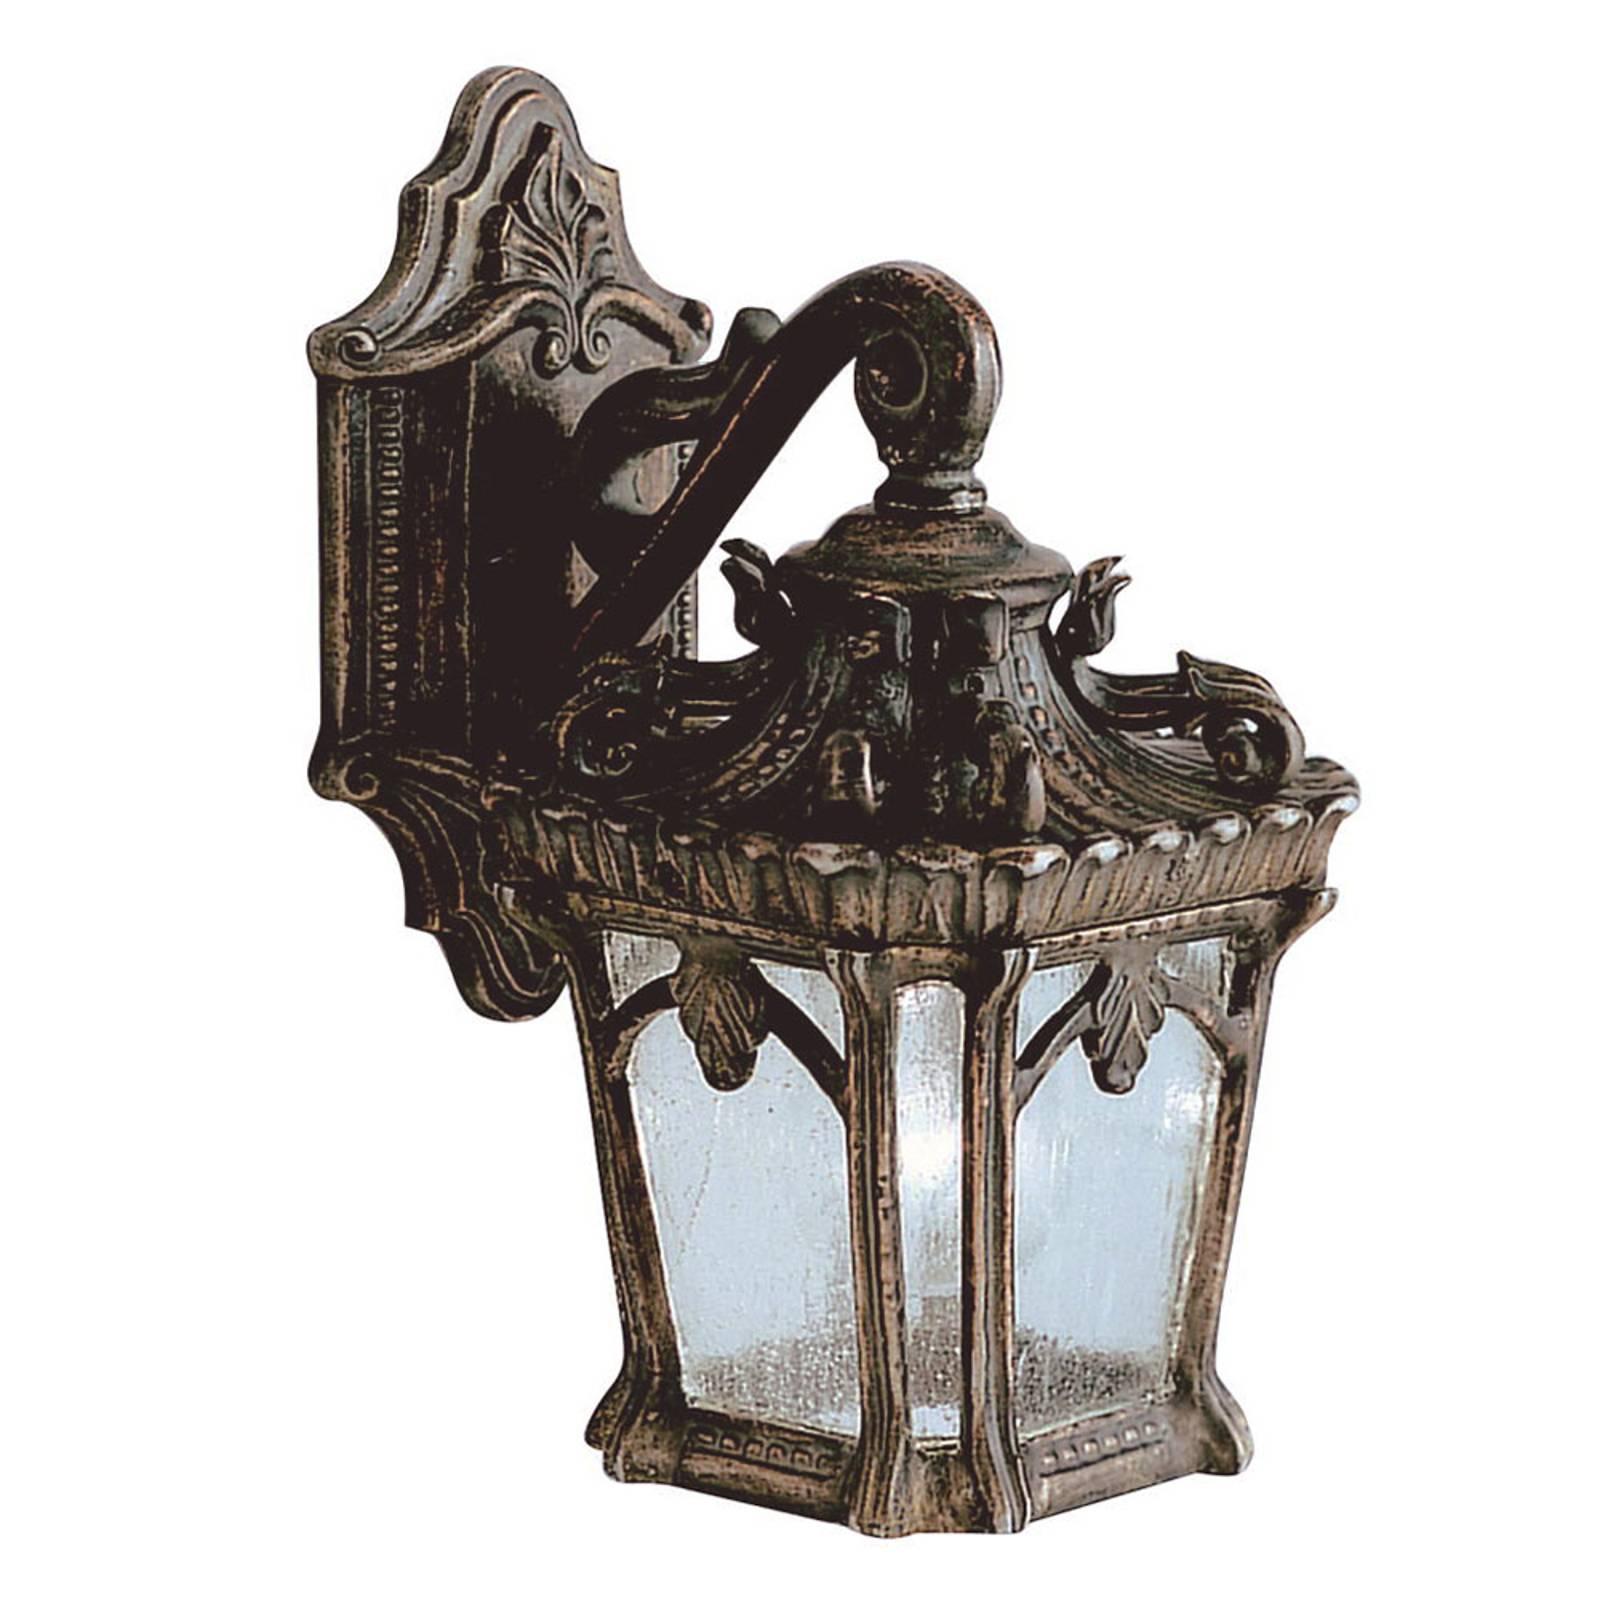 Buitenwandlamp Tournai in antiek ontwerp